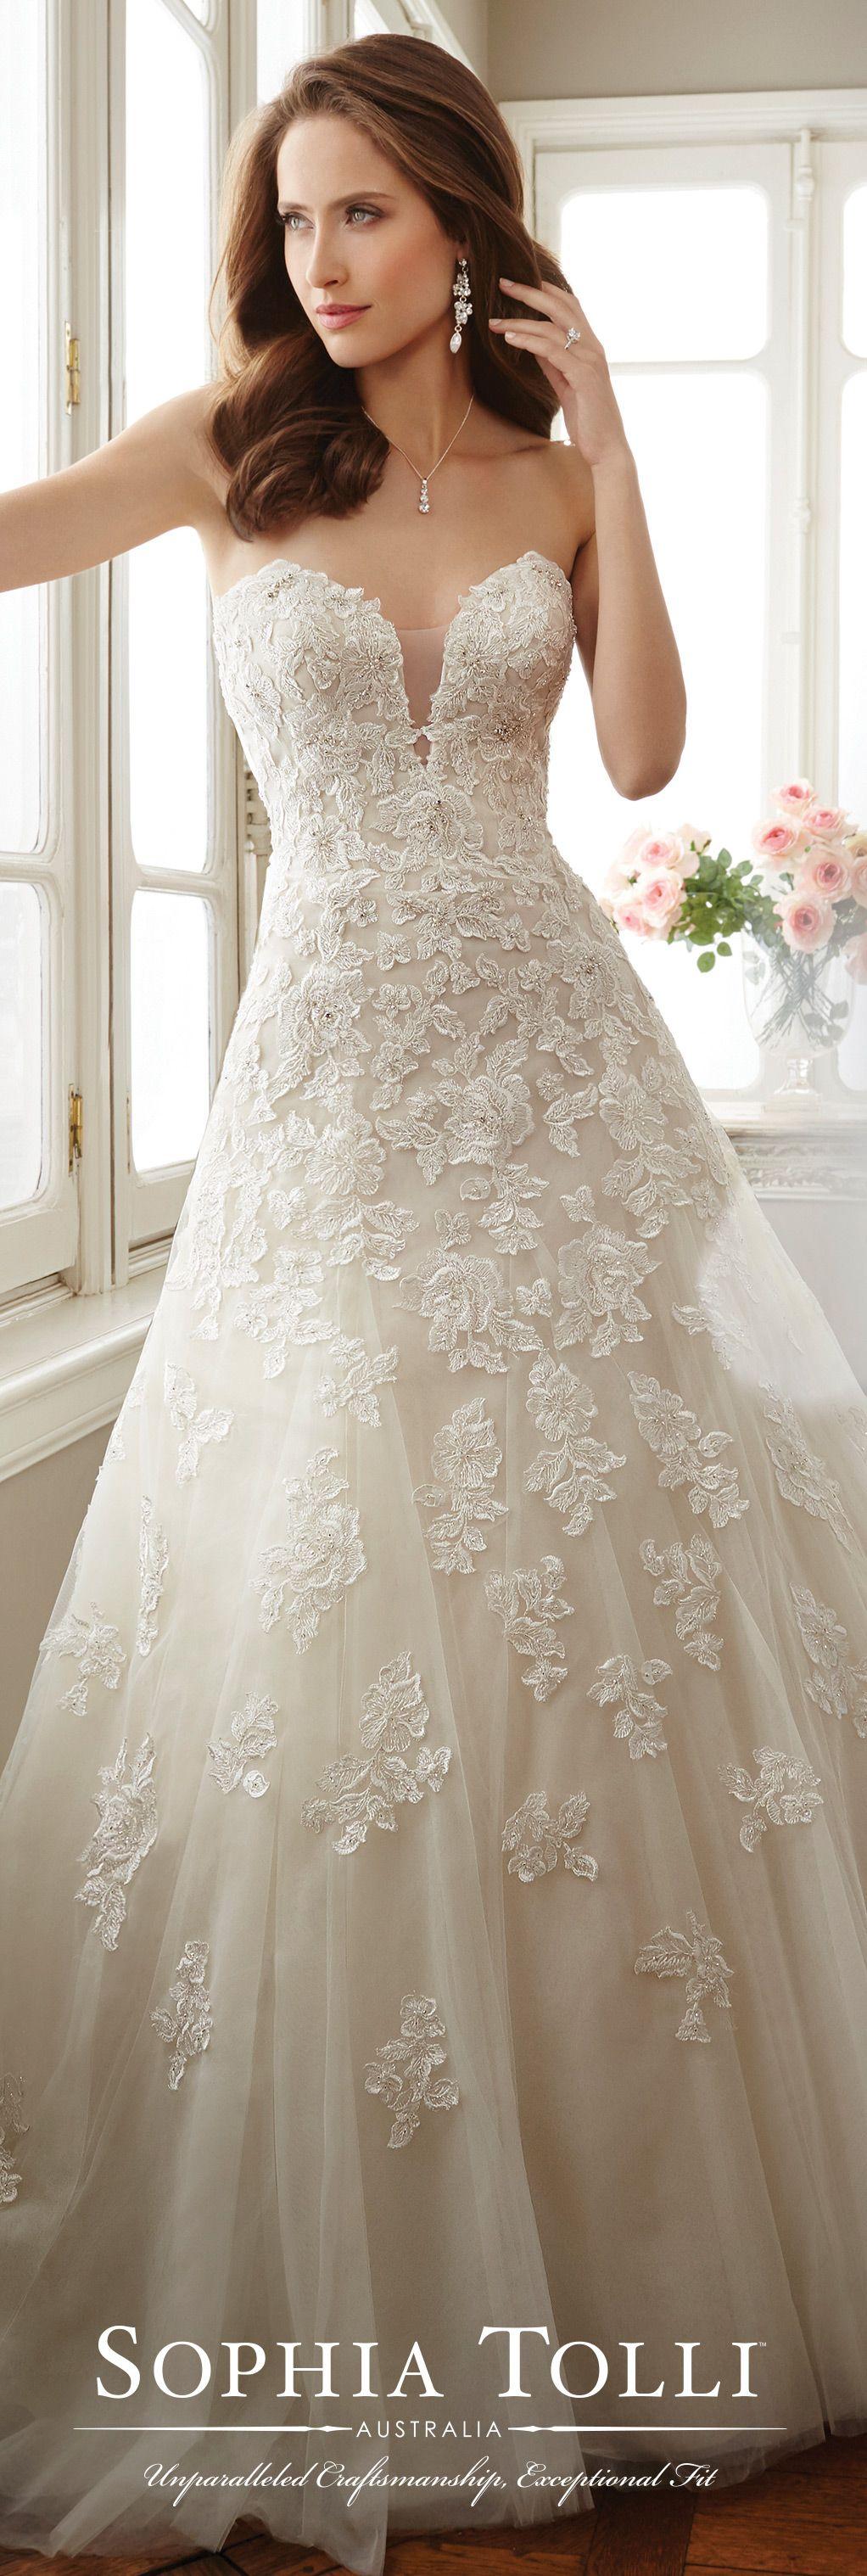 Y antoinette pinterest wedding dress gowns and weddings